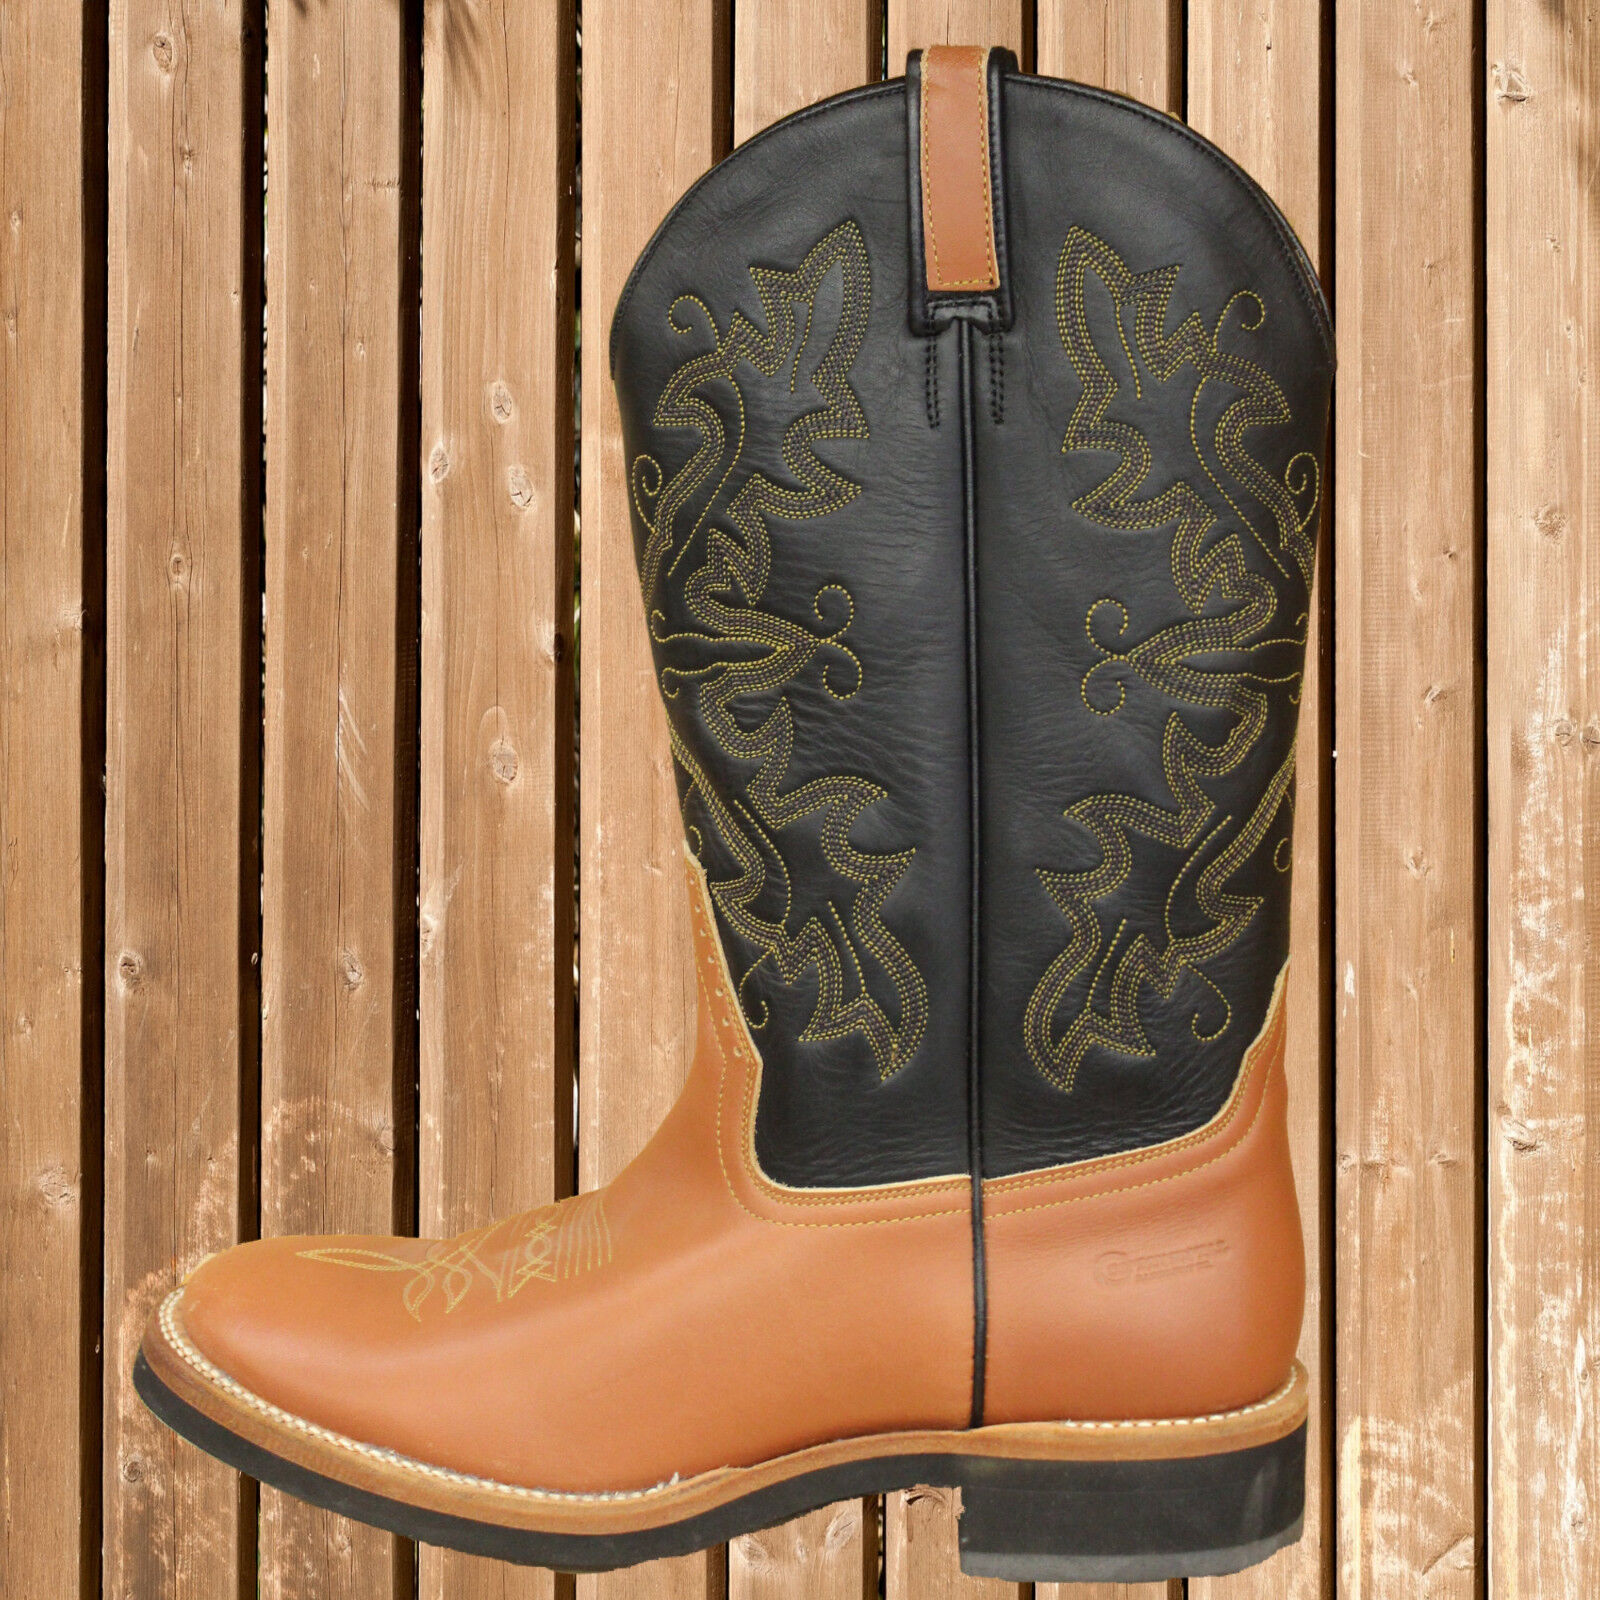 Continental Western Stiefel, Westernstiefel, Continental, Western, Western, Continental, schwarz-braun fde12b